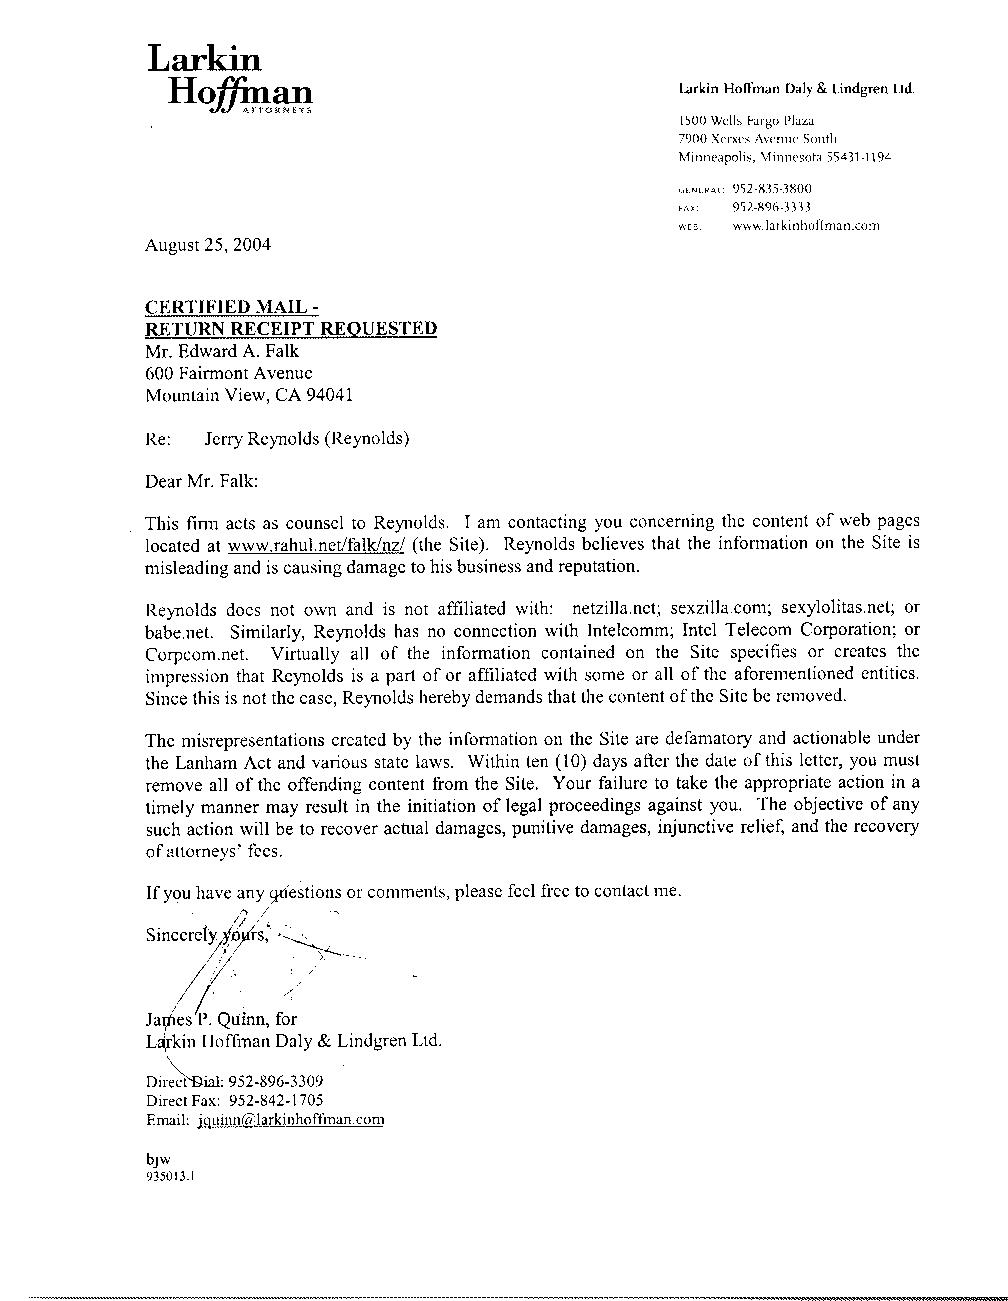 trademark cease and desist letter sample